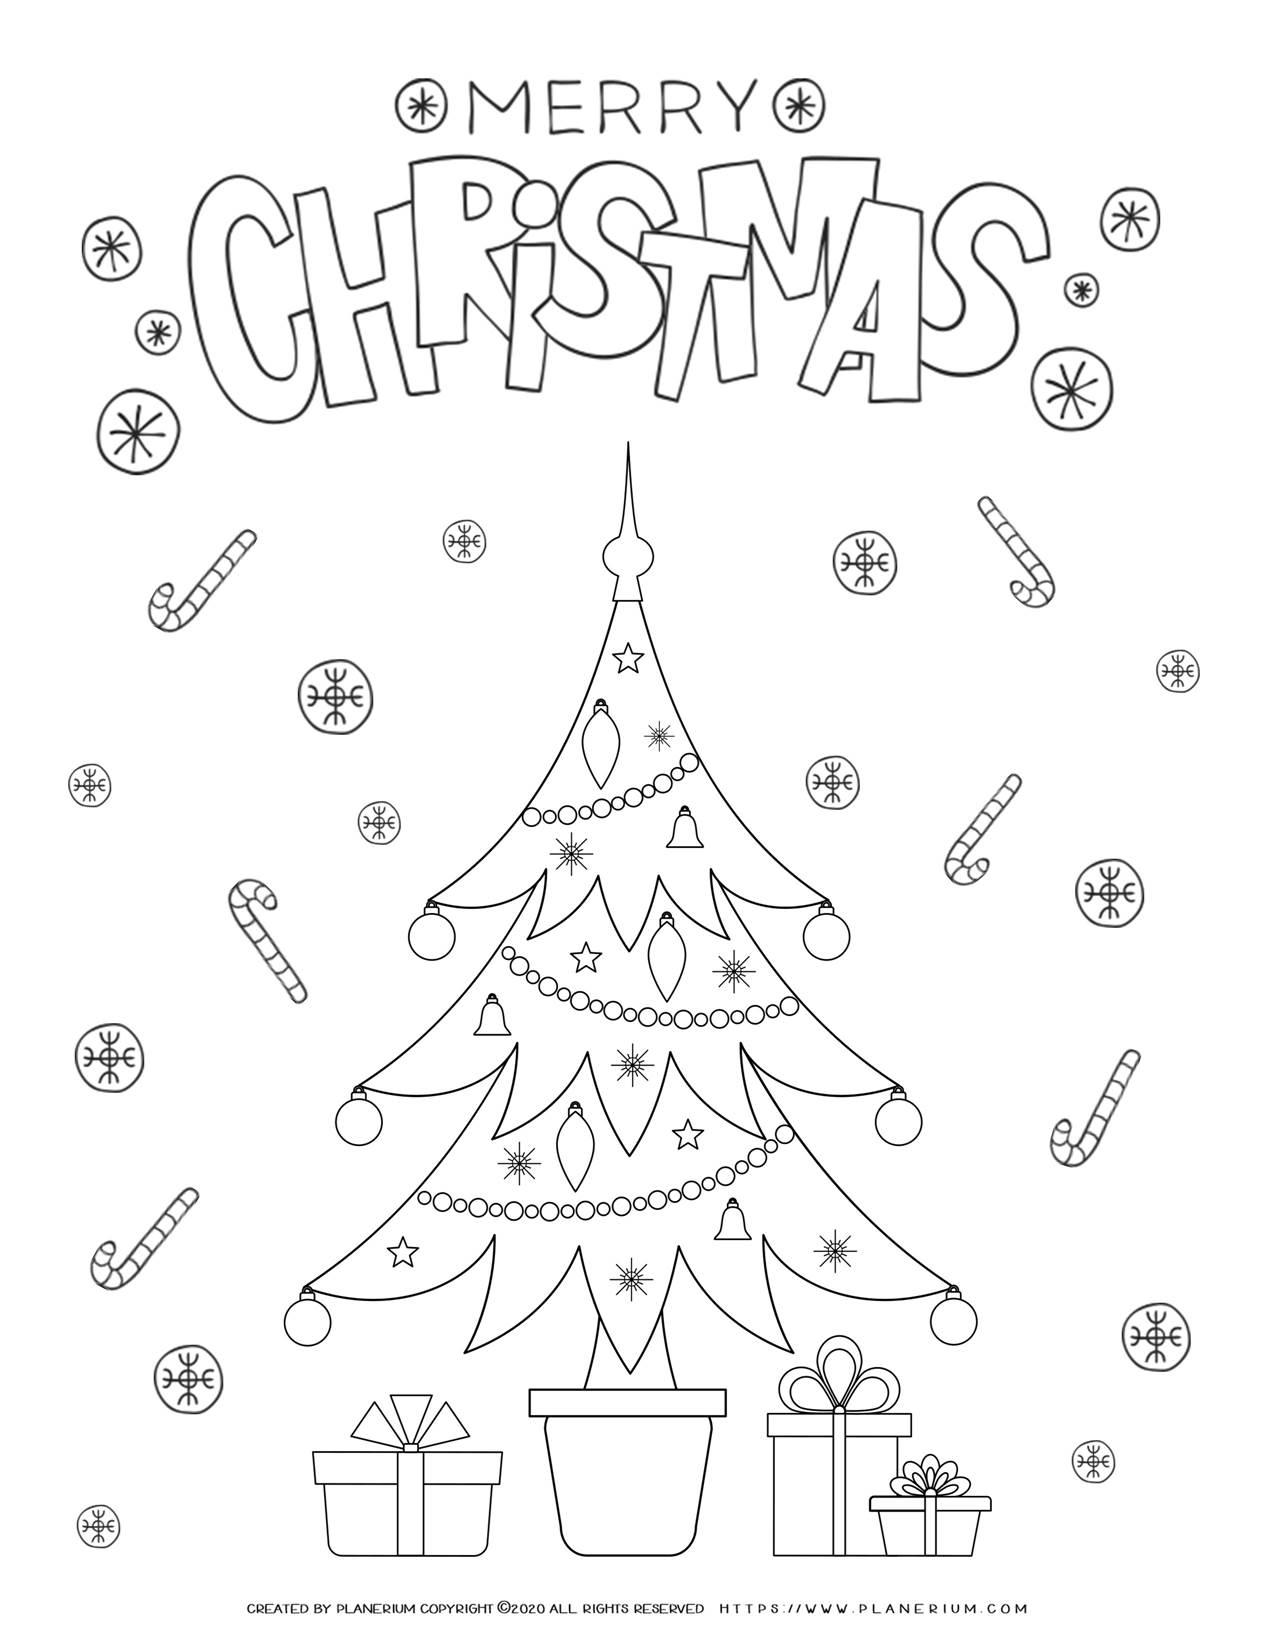 Christmas Tree Coloring Page   Free Printables   Planerium